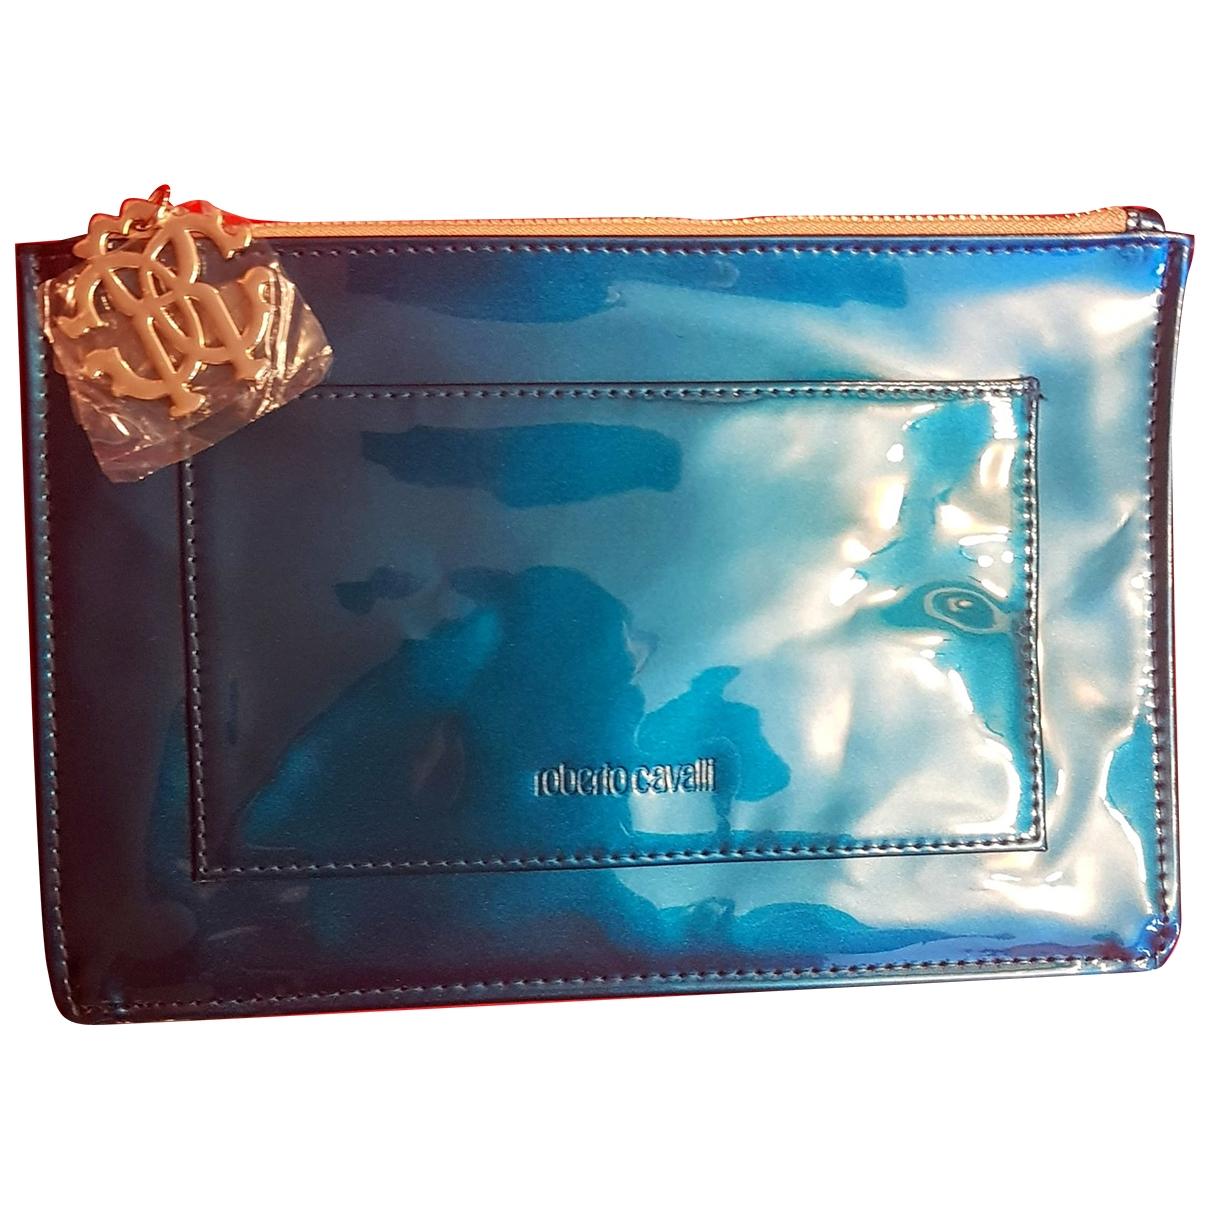 Roberto Cavalli \N Blue Leather Clutch bag for Women \N